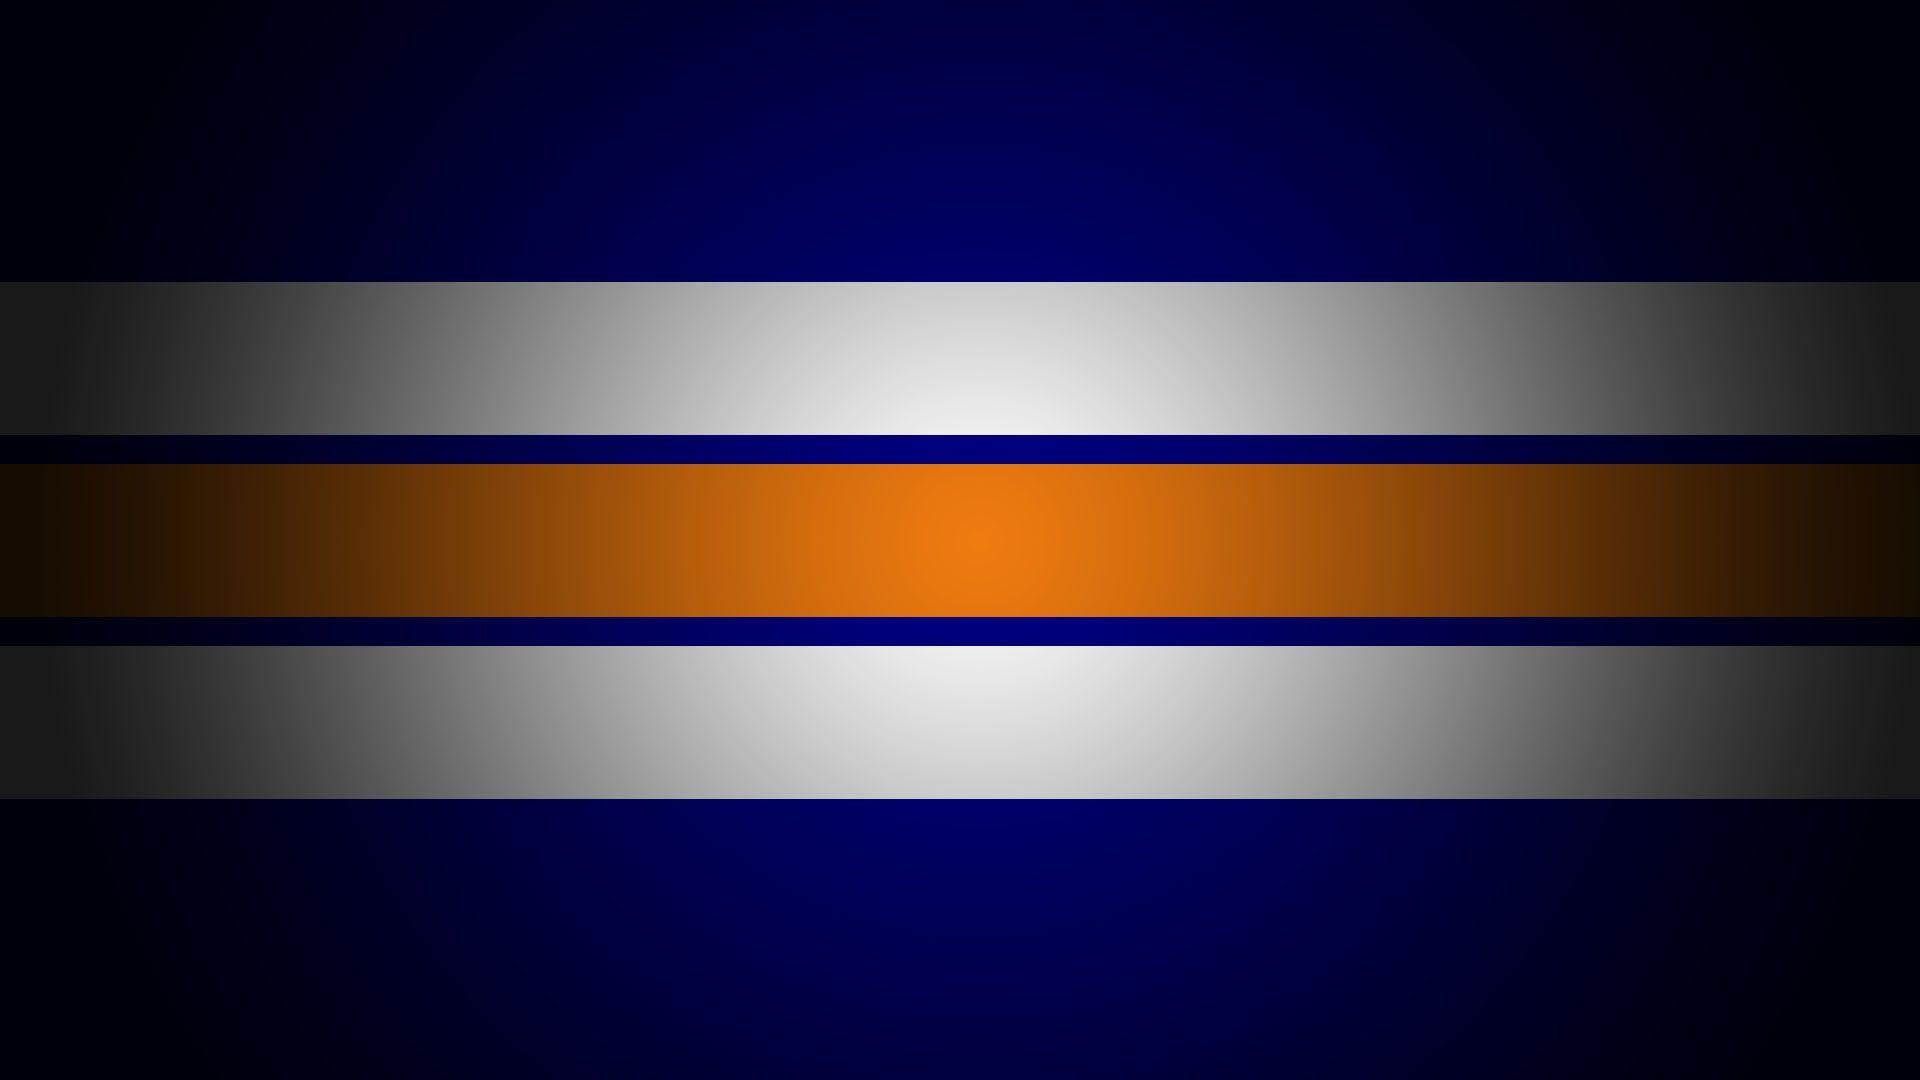 Download Wallpaper Logo Edmonton Oilers - 575967e705821bea0dbf3fb07e270cc1  Snapshot_73813.jpg